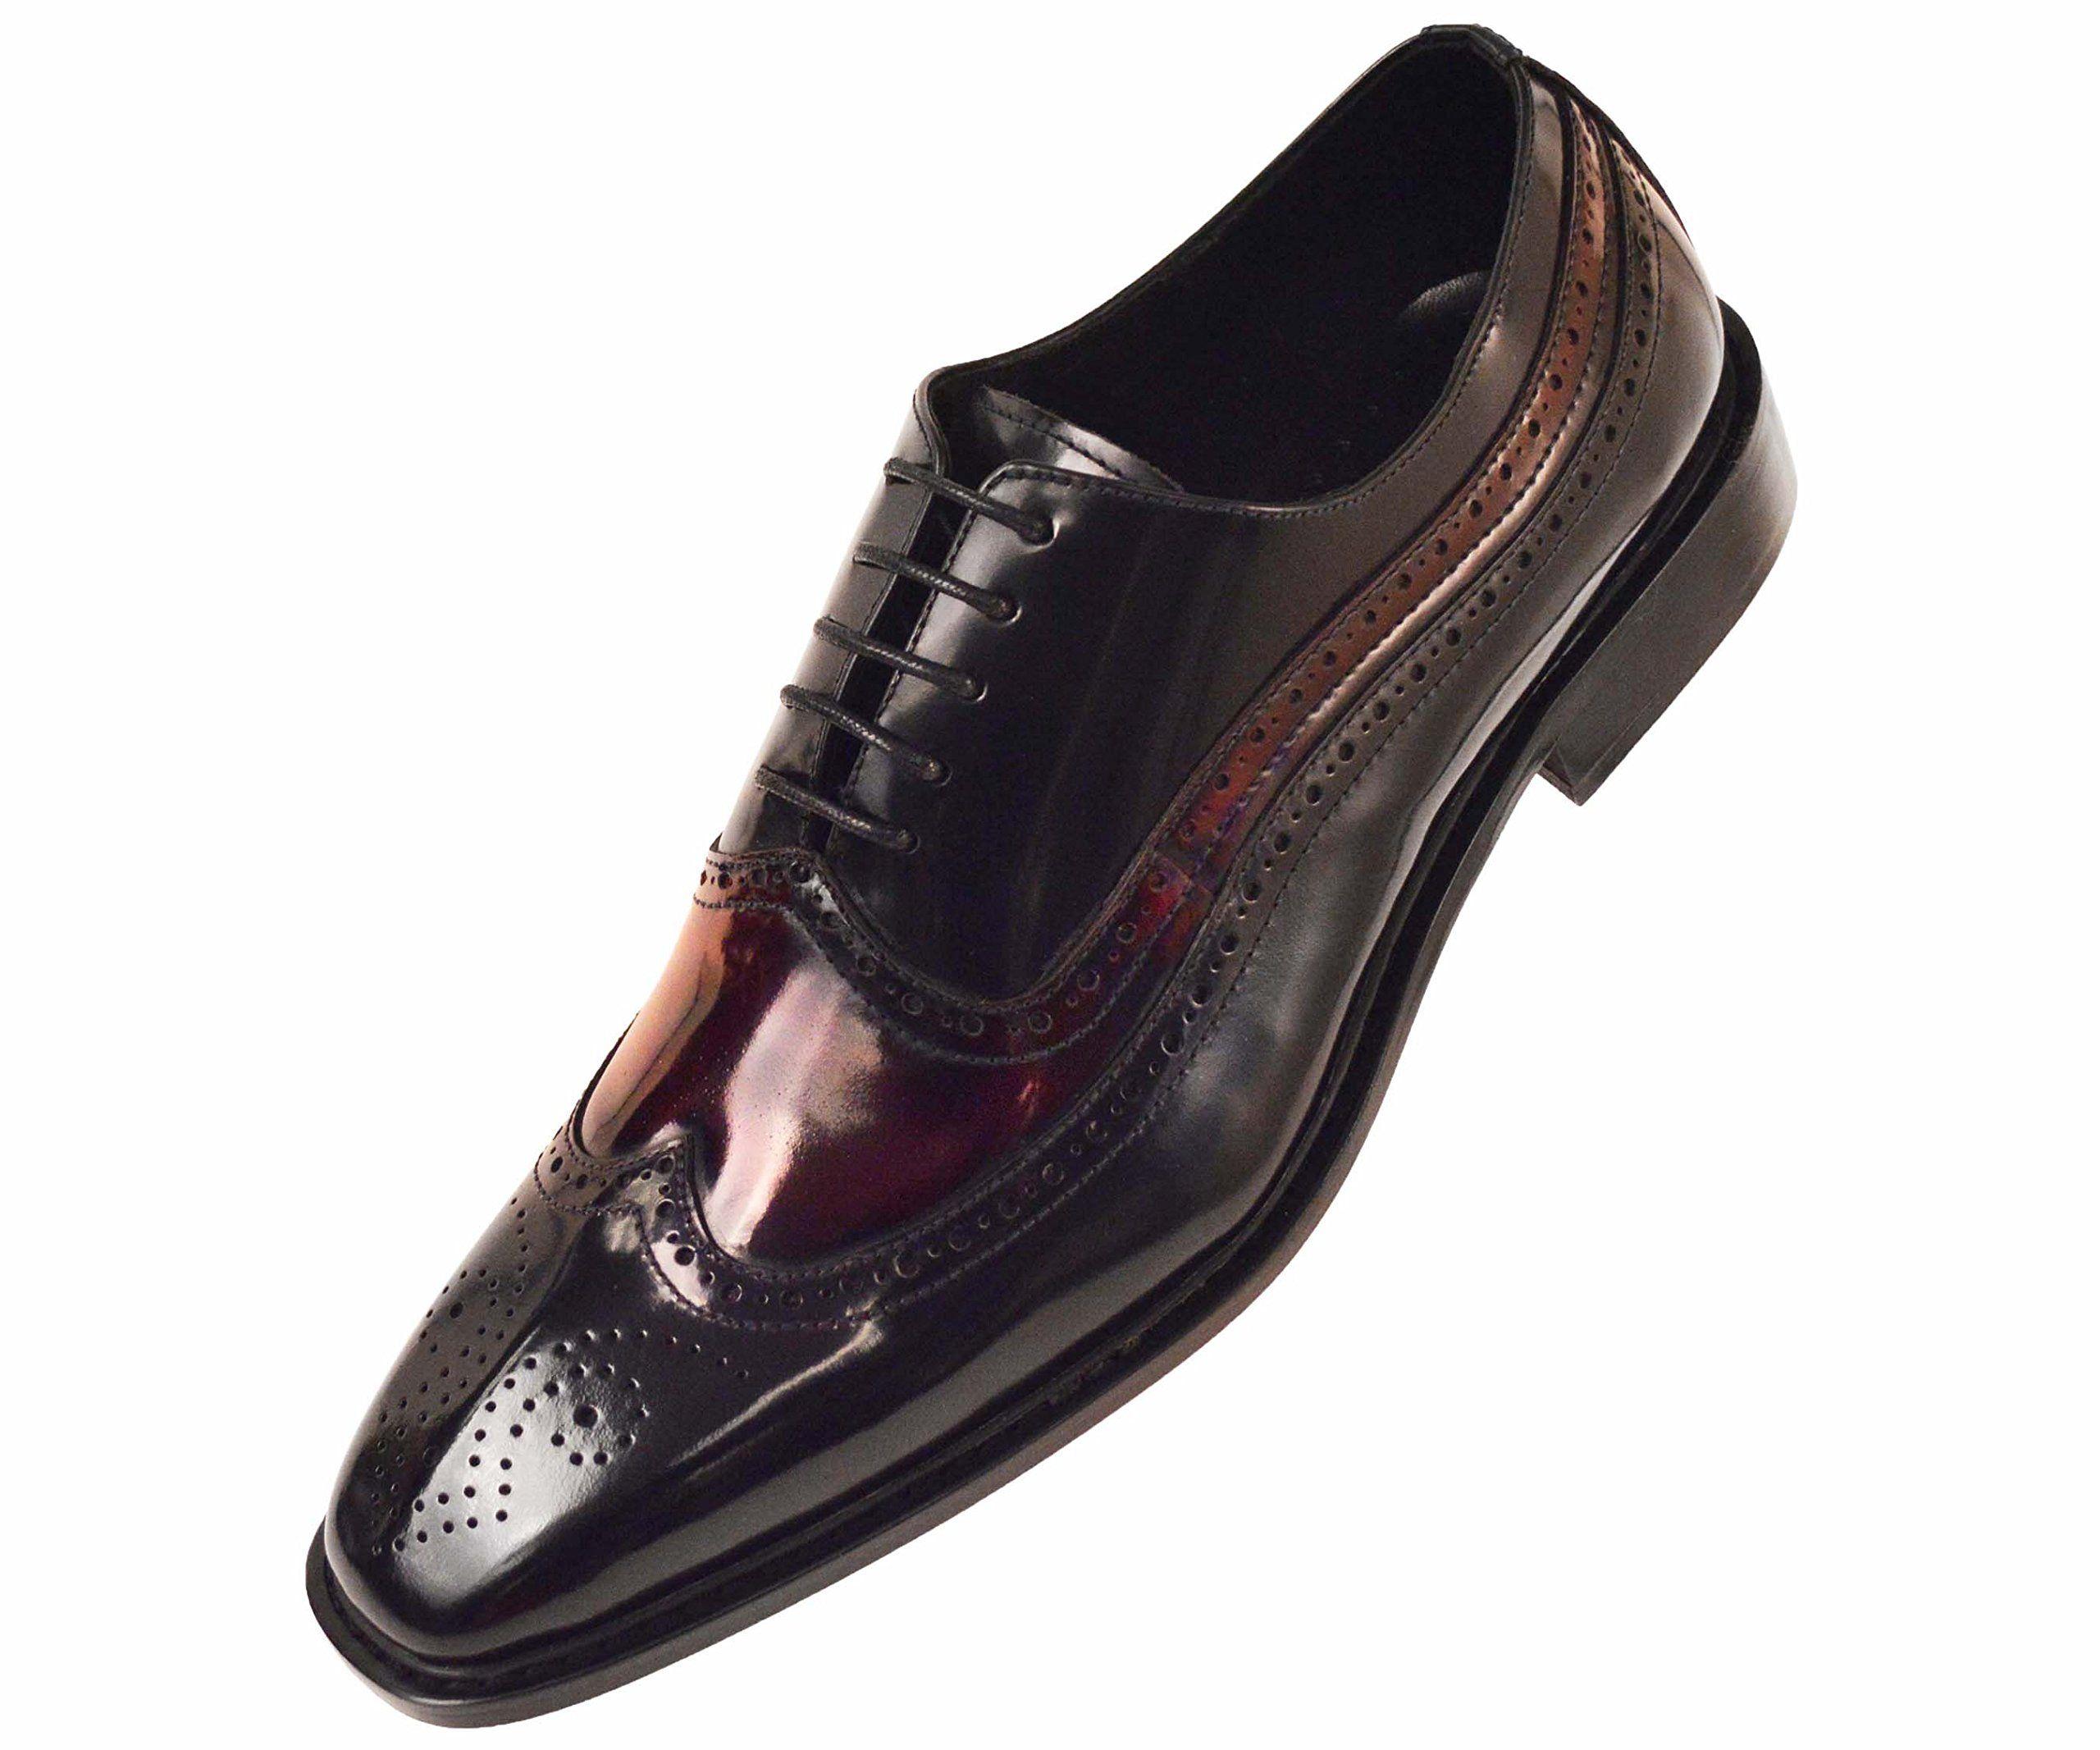 b23509933bbfe Burgundy And Black Mens Dress Shoes | Saddha